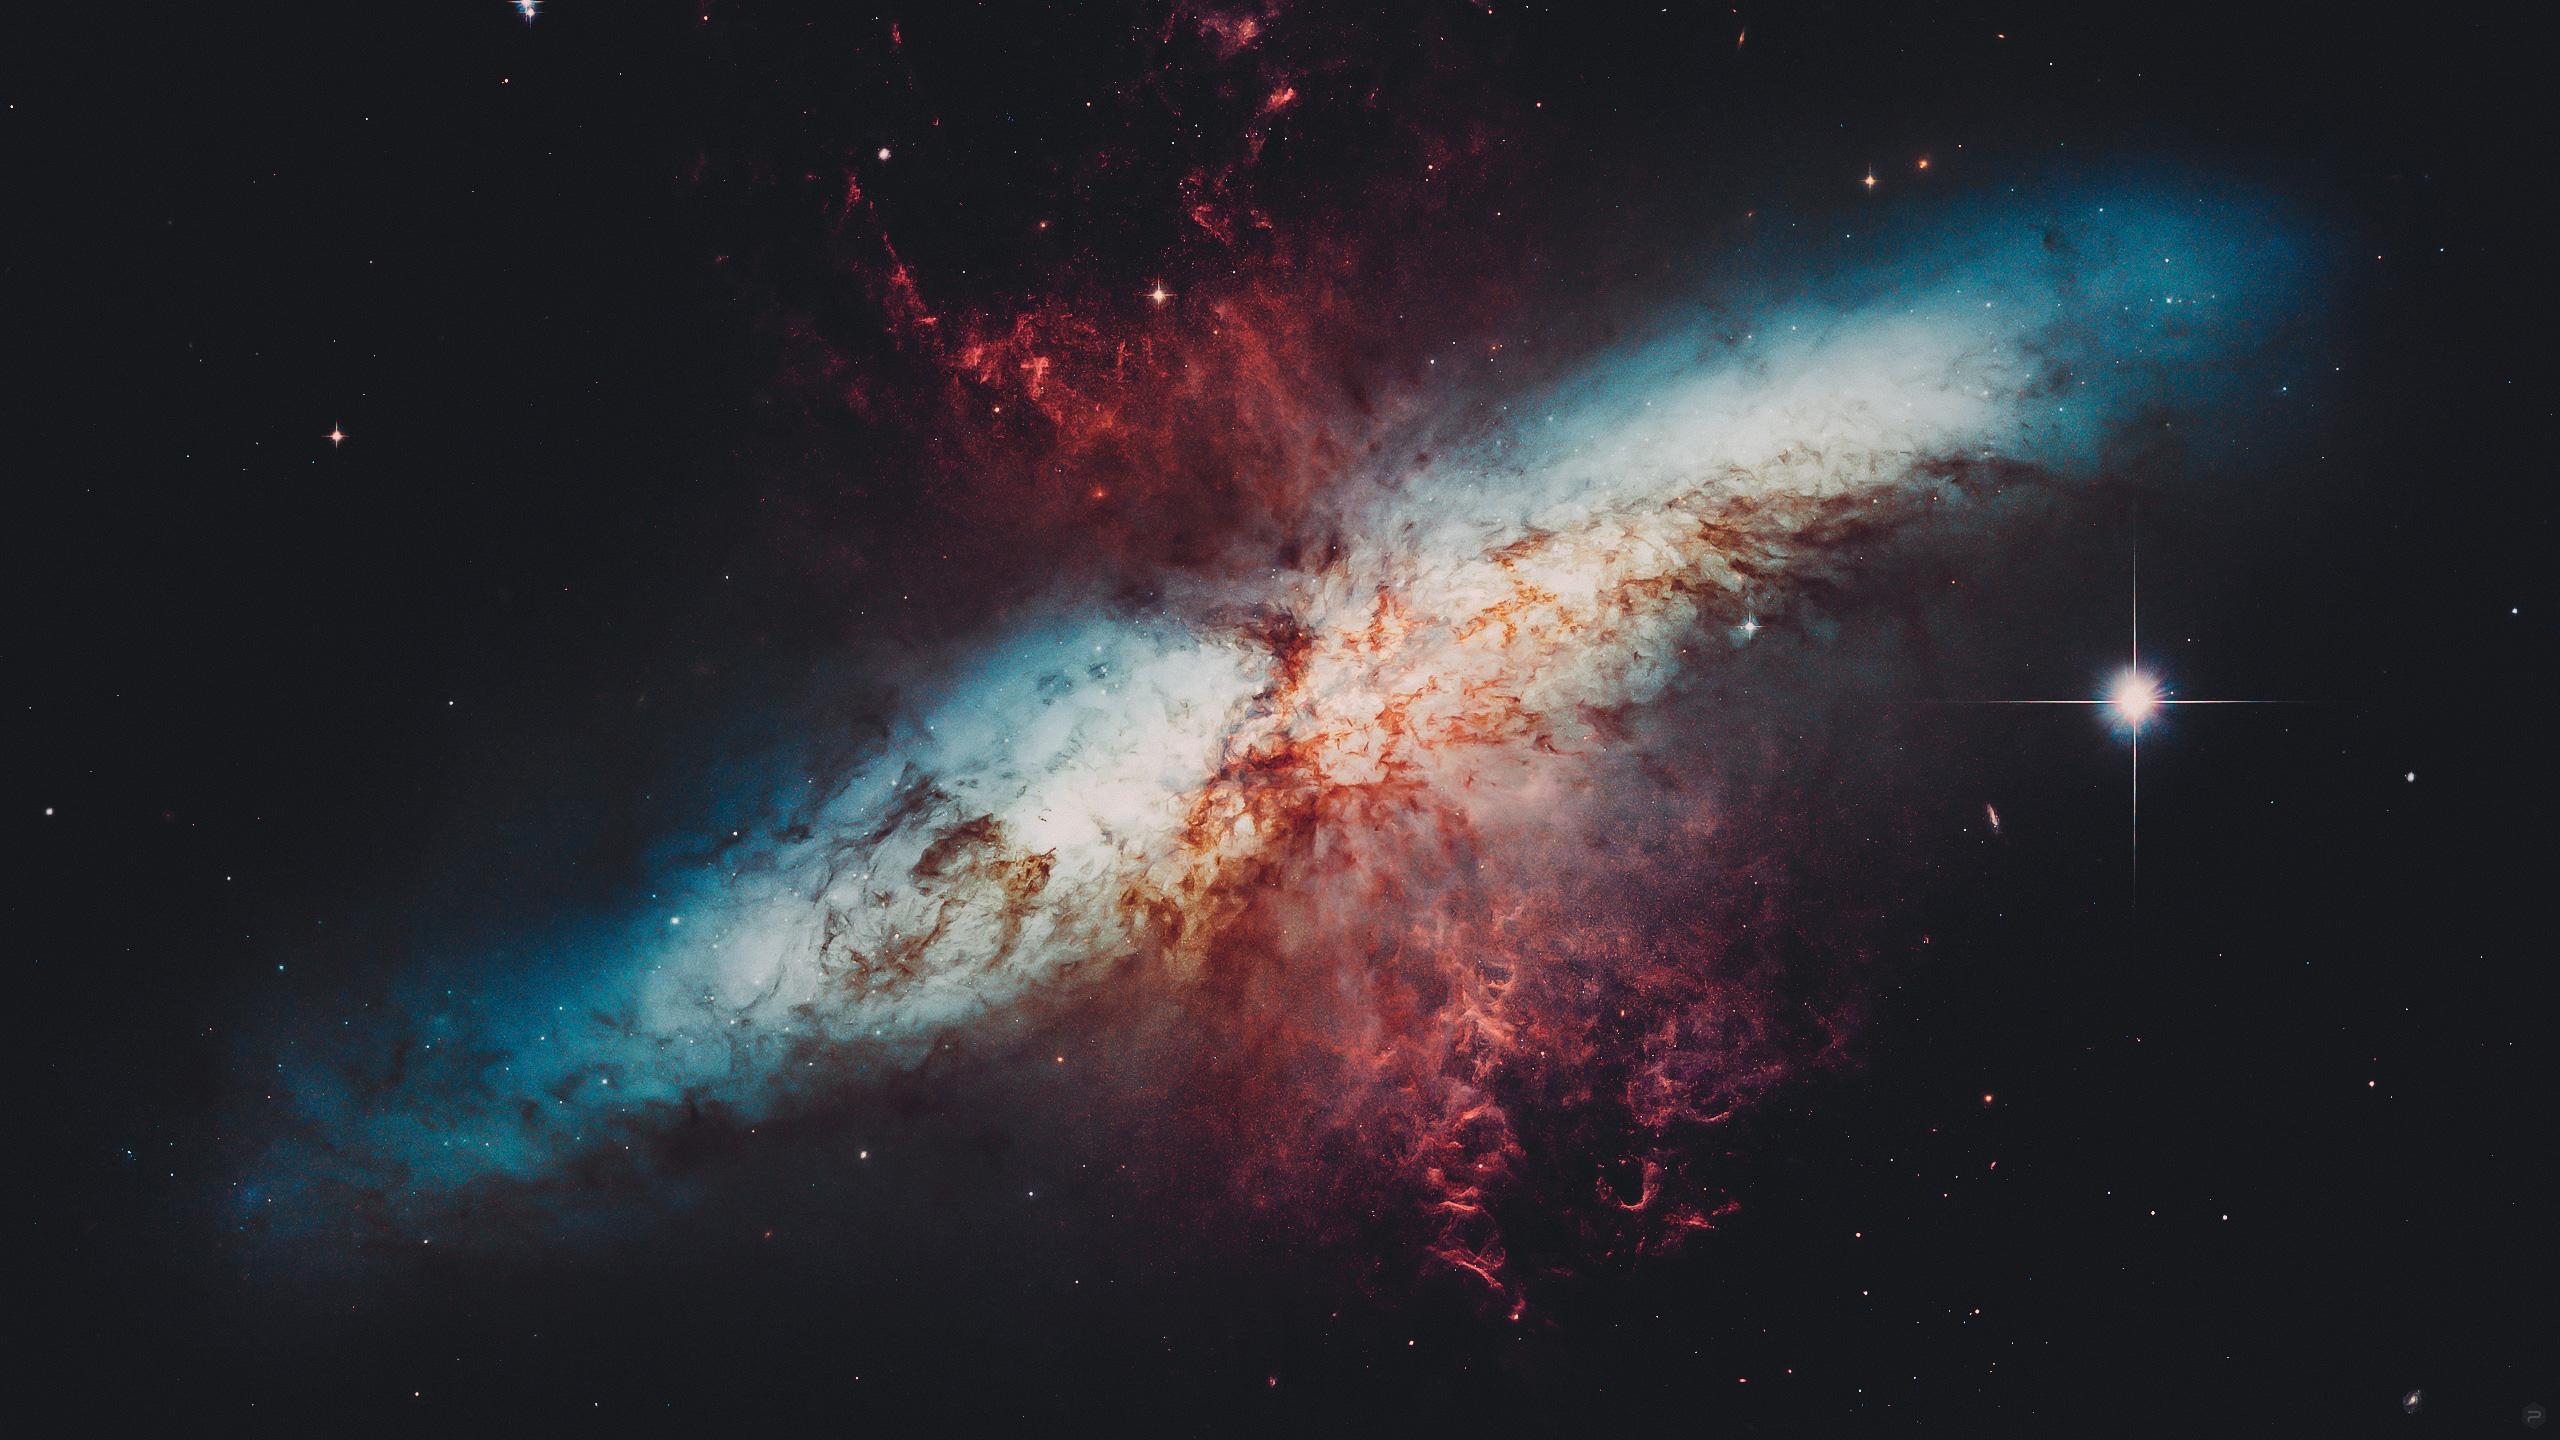 General 2560x1440 NASA Messier 82 space galaxy universe